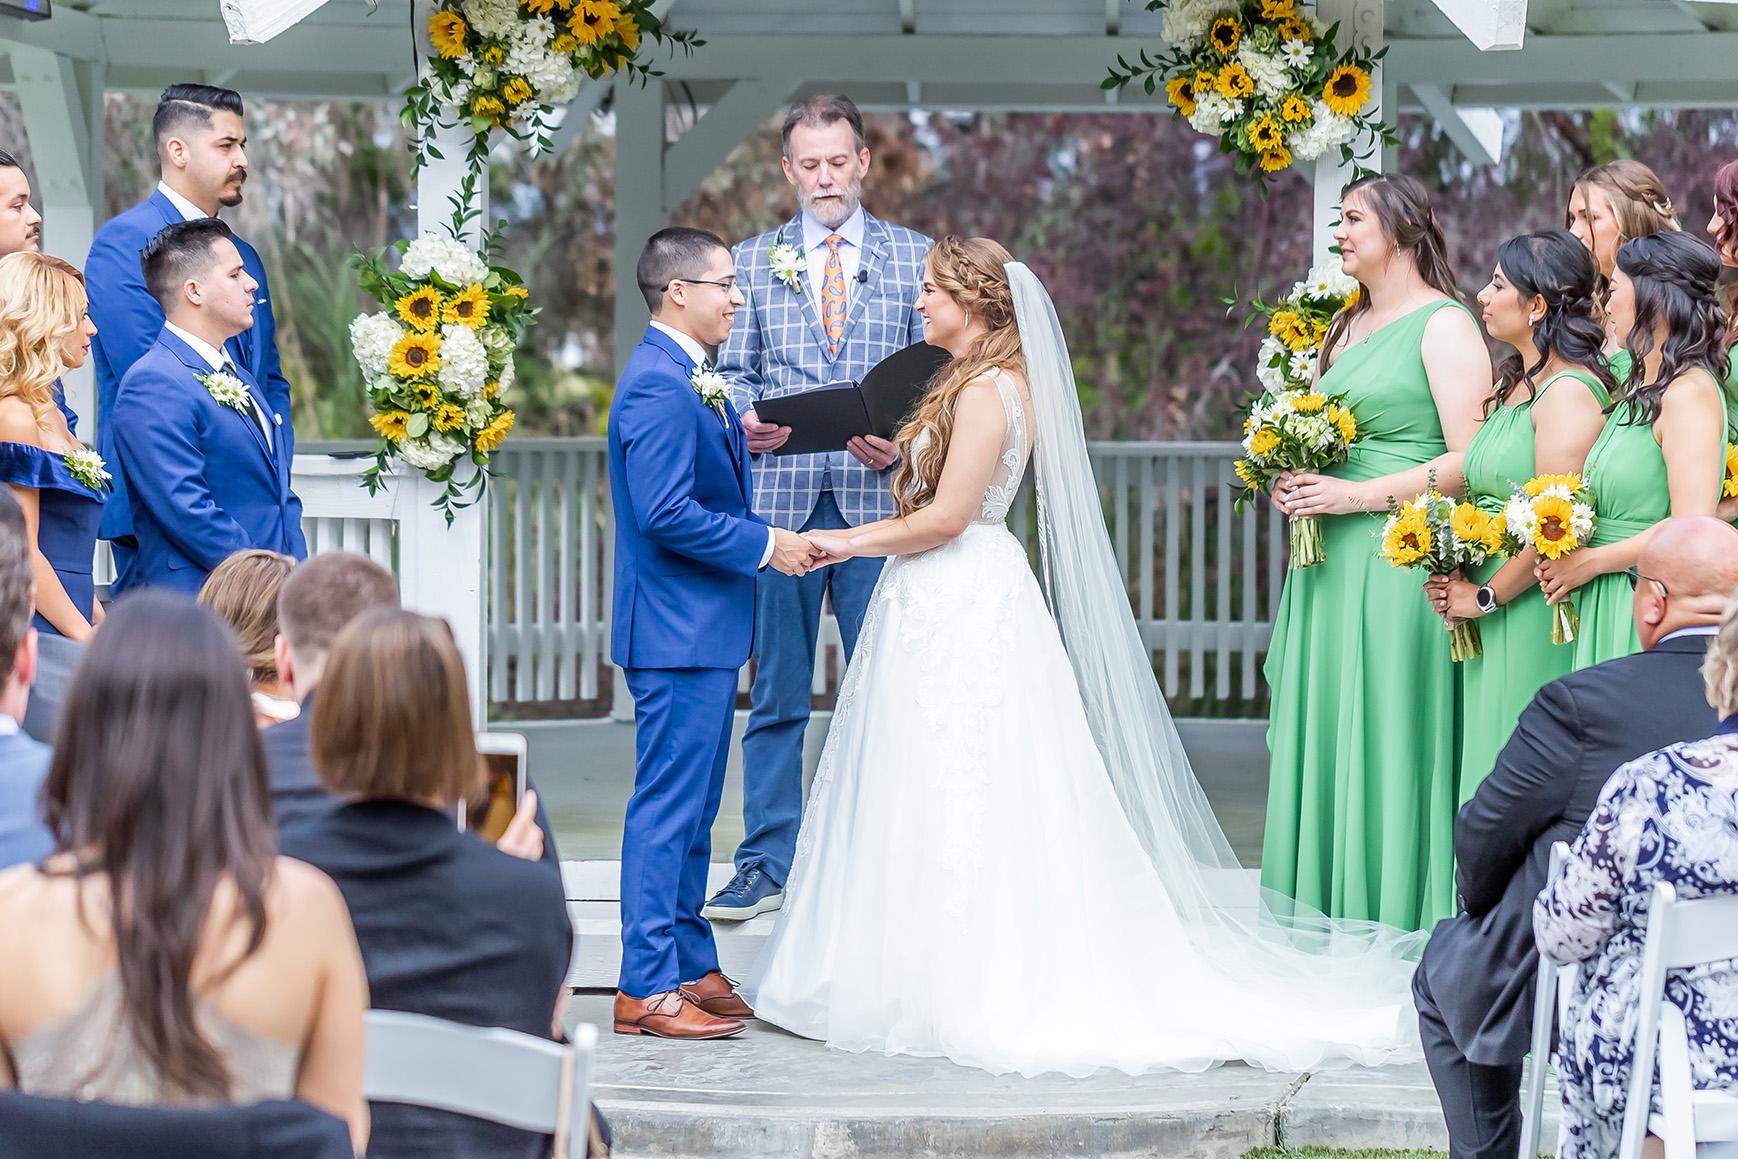 Outdoor ceremony - Orchard - Menifee, California - Riverside County - Wedgewood Weddings